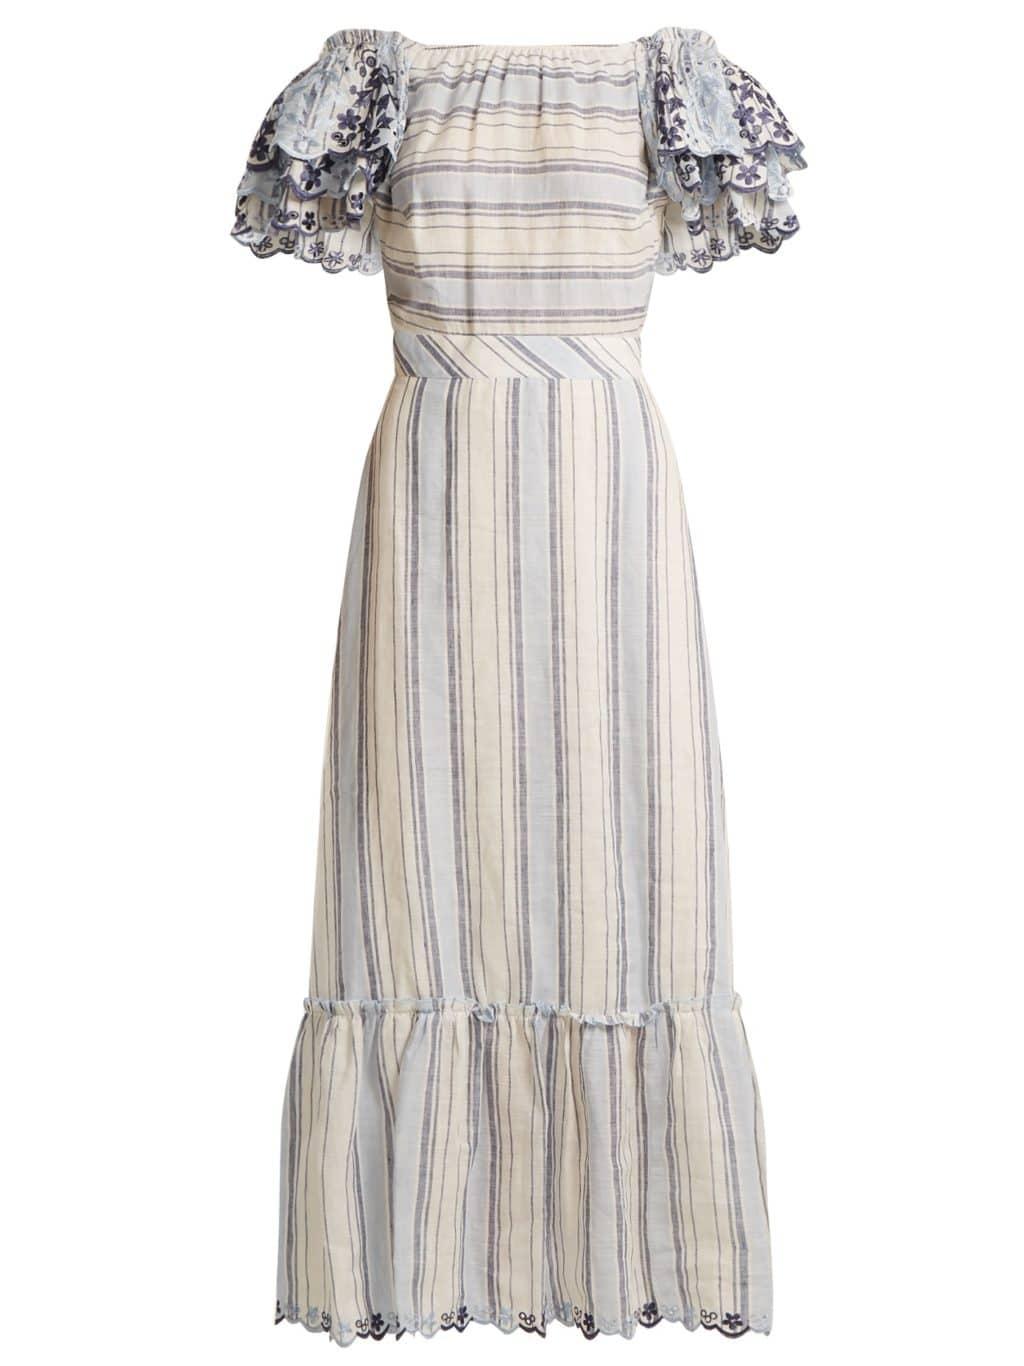 GÜL HÜRGEL Ruffled-sleeve Striped Linen Tonal Blue / White Dress